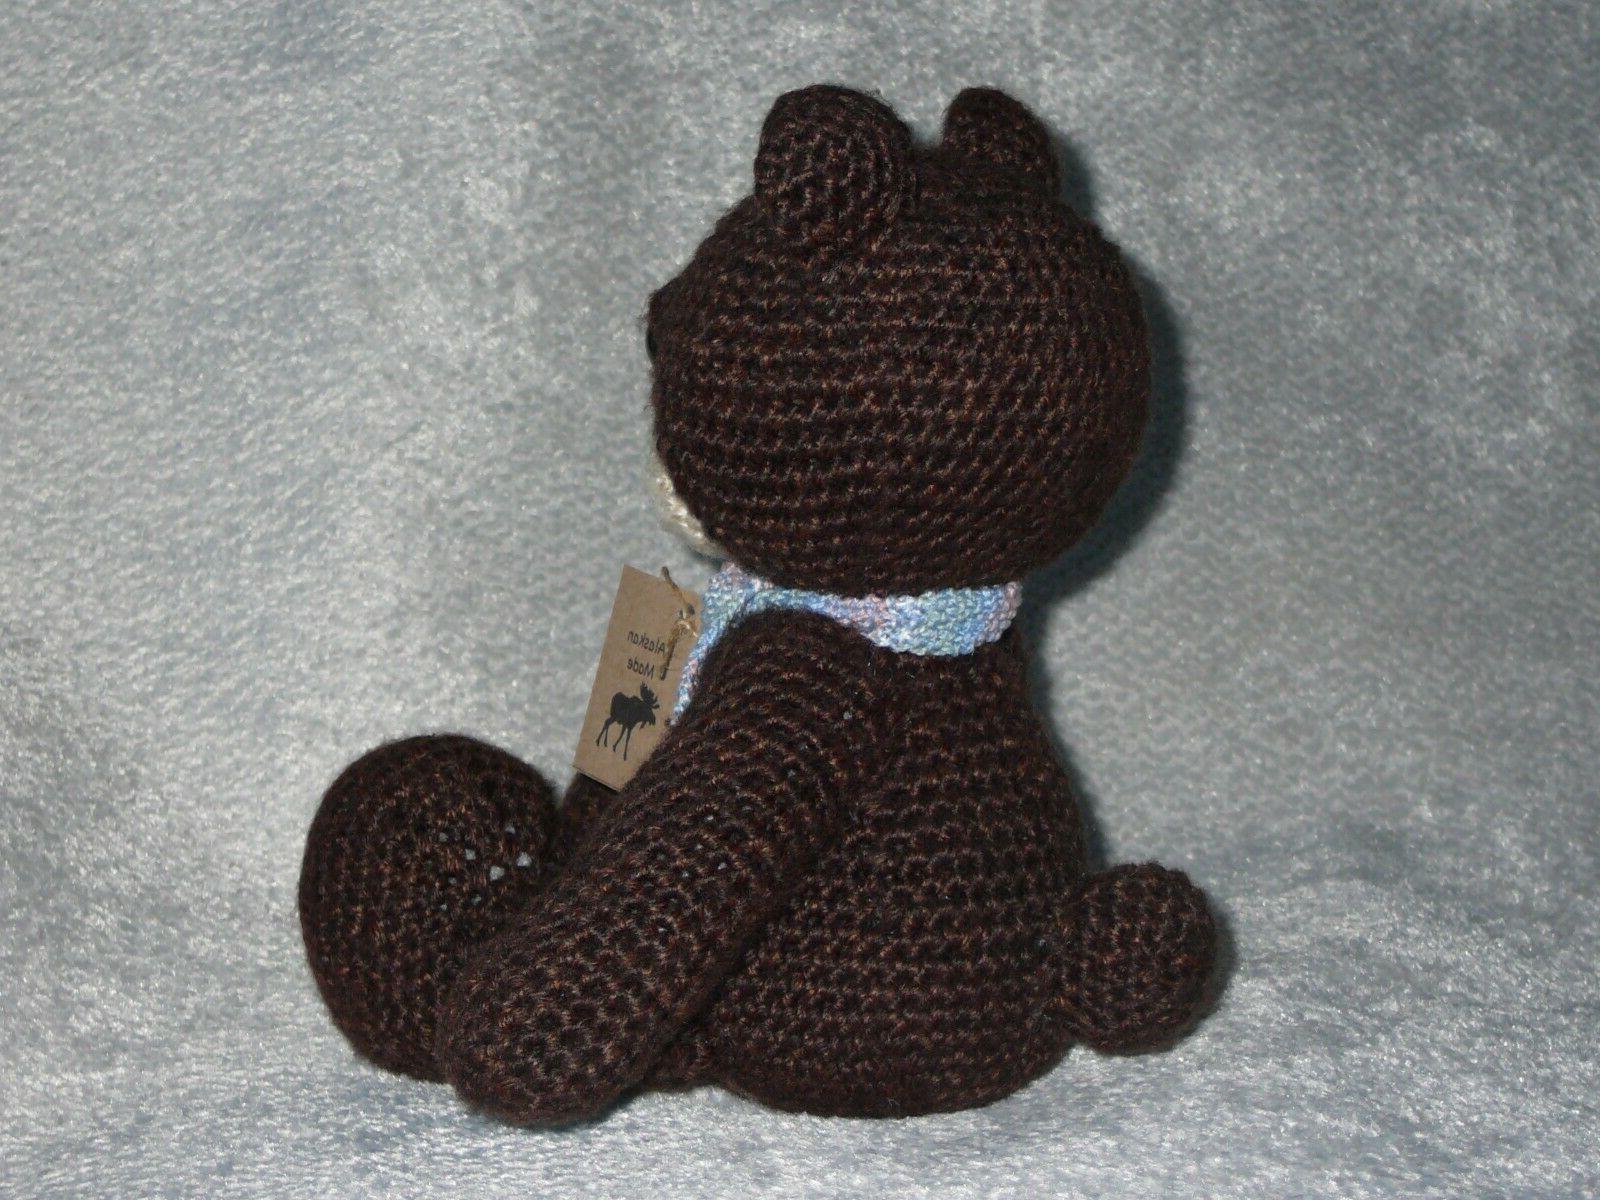 Hand Teddy Hand in Alaska Stuffed Animals